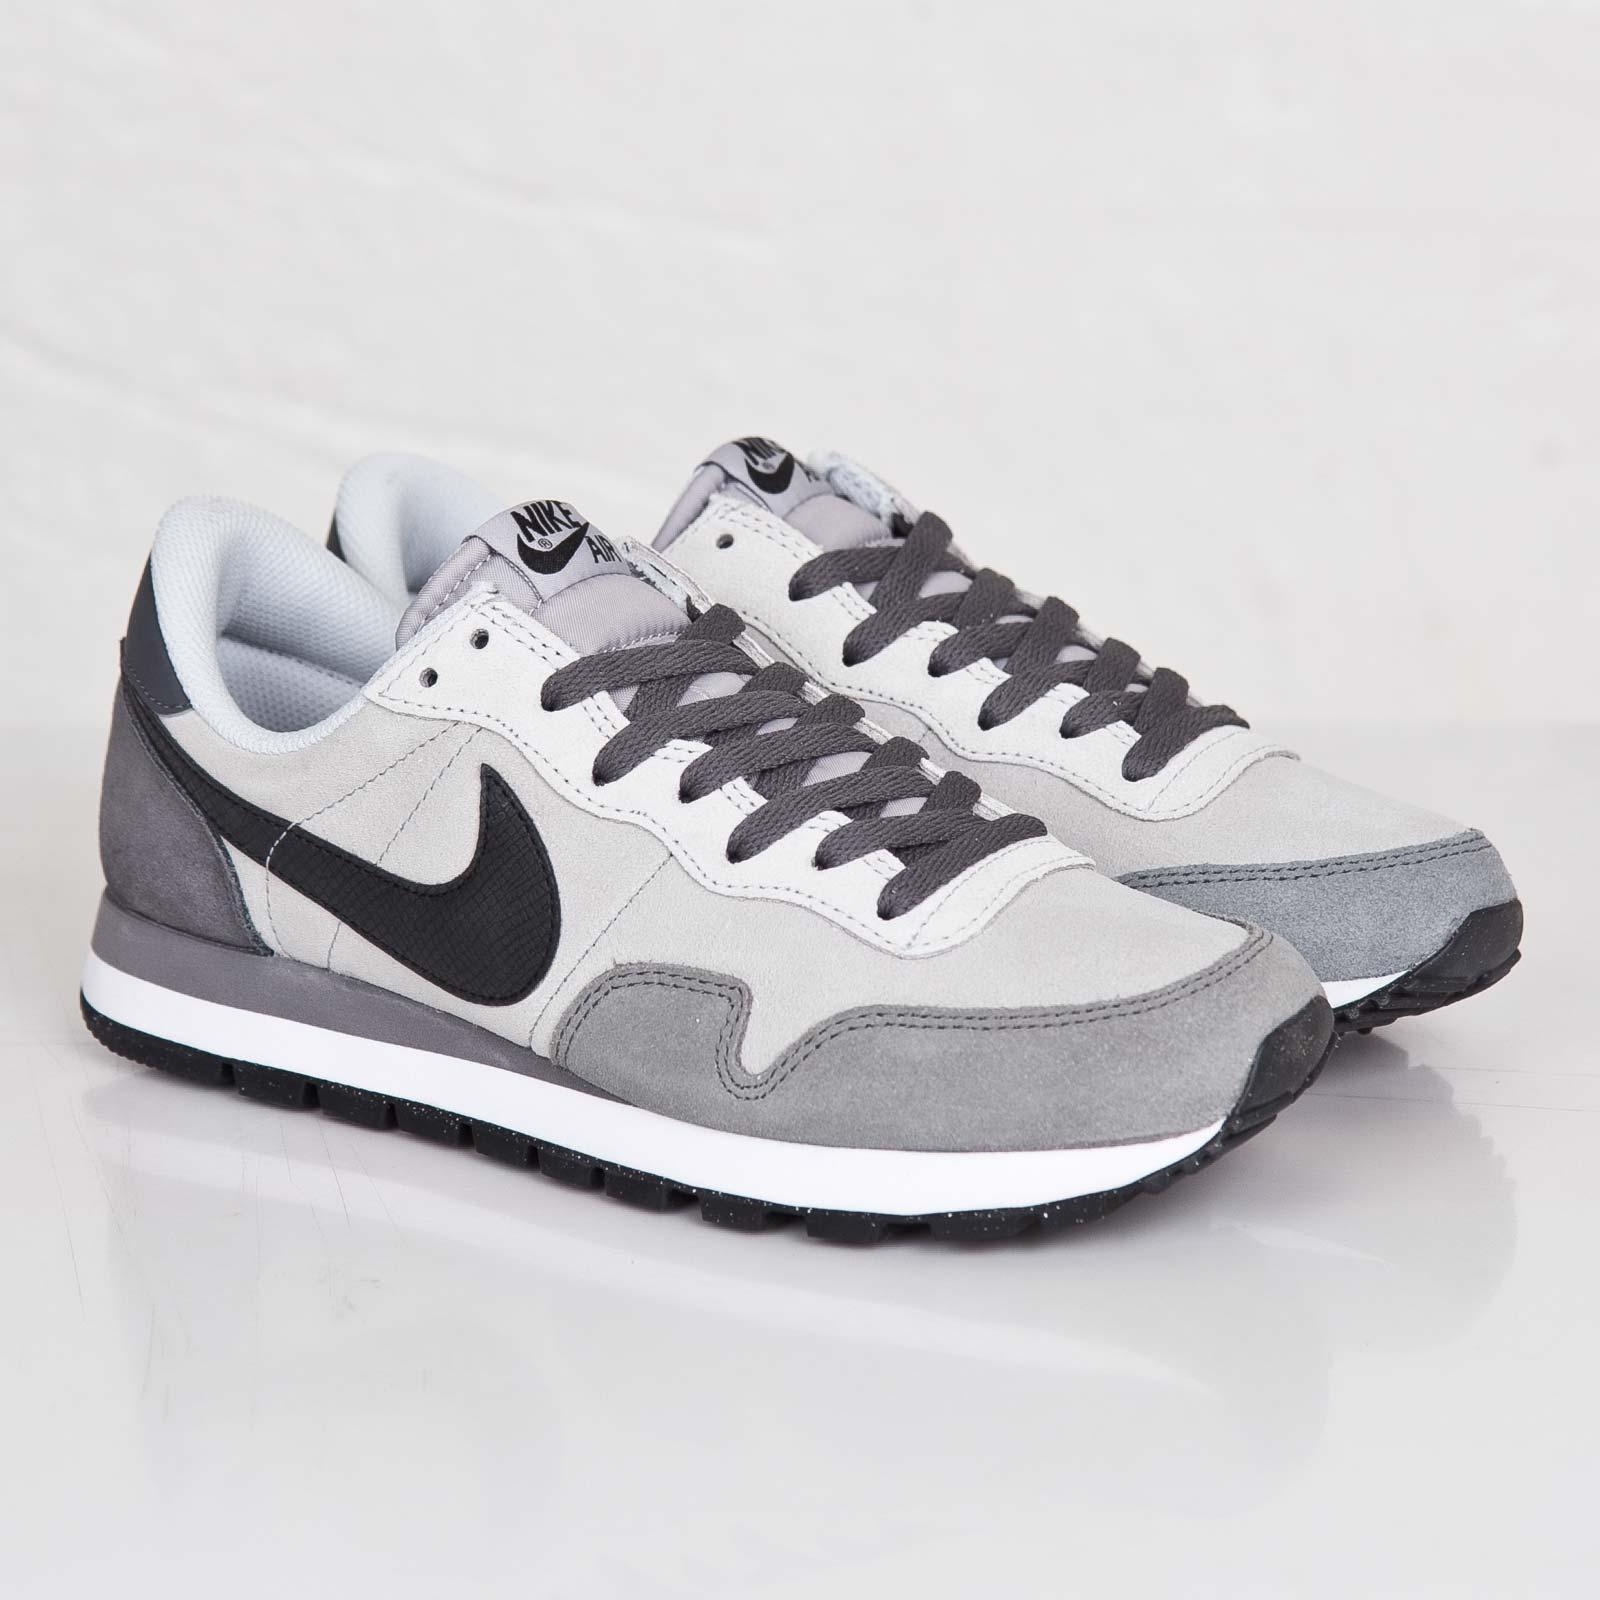 nike sneaker sale online kaufen, Nike Pegasus 83 Sneaker